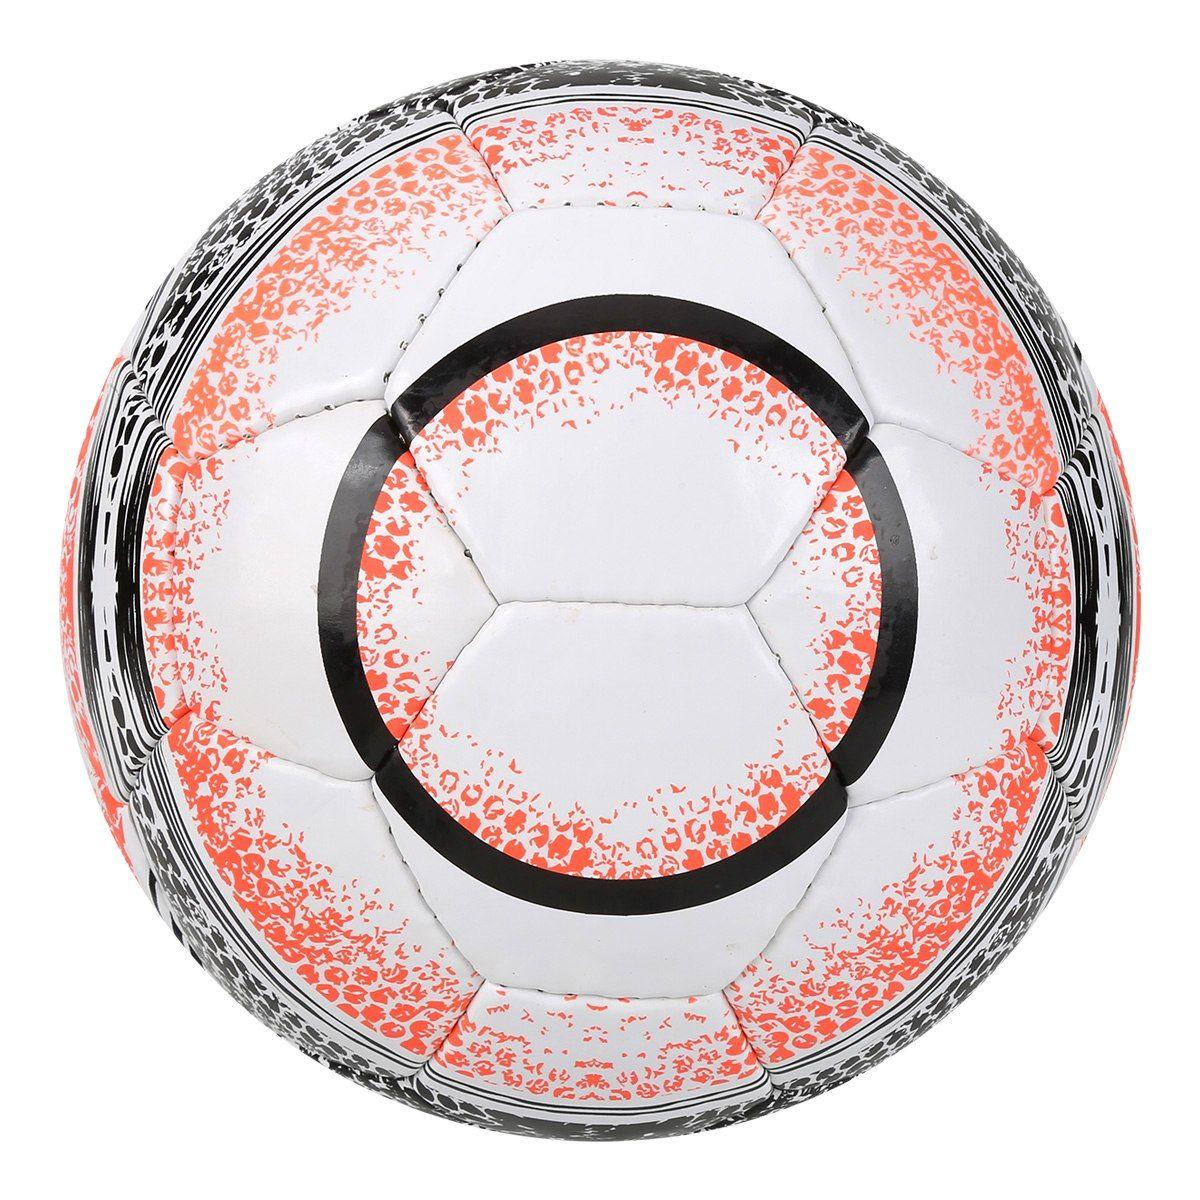 Bola de Futsal Penalty Storm 500 Costurada 8